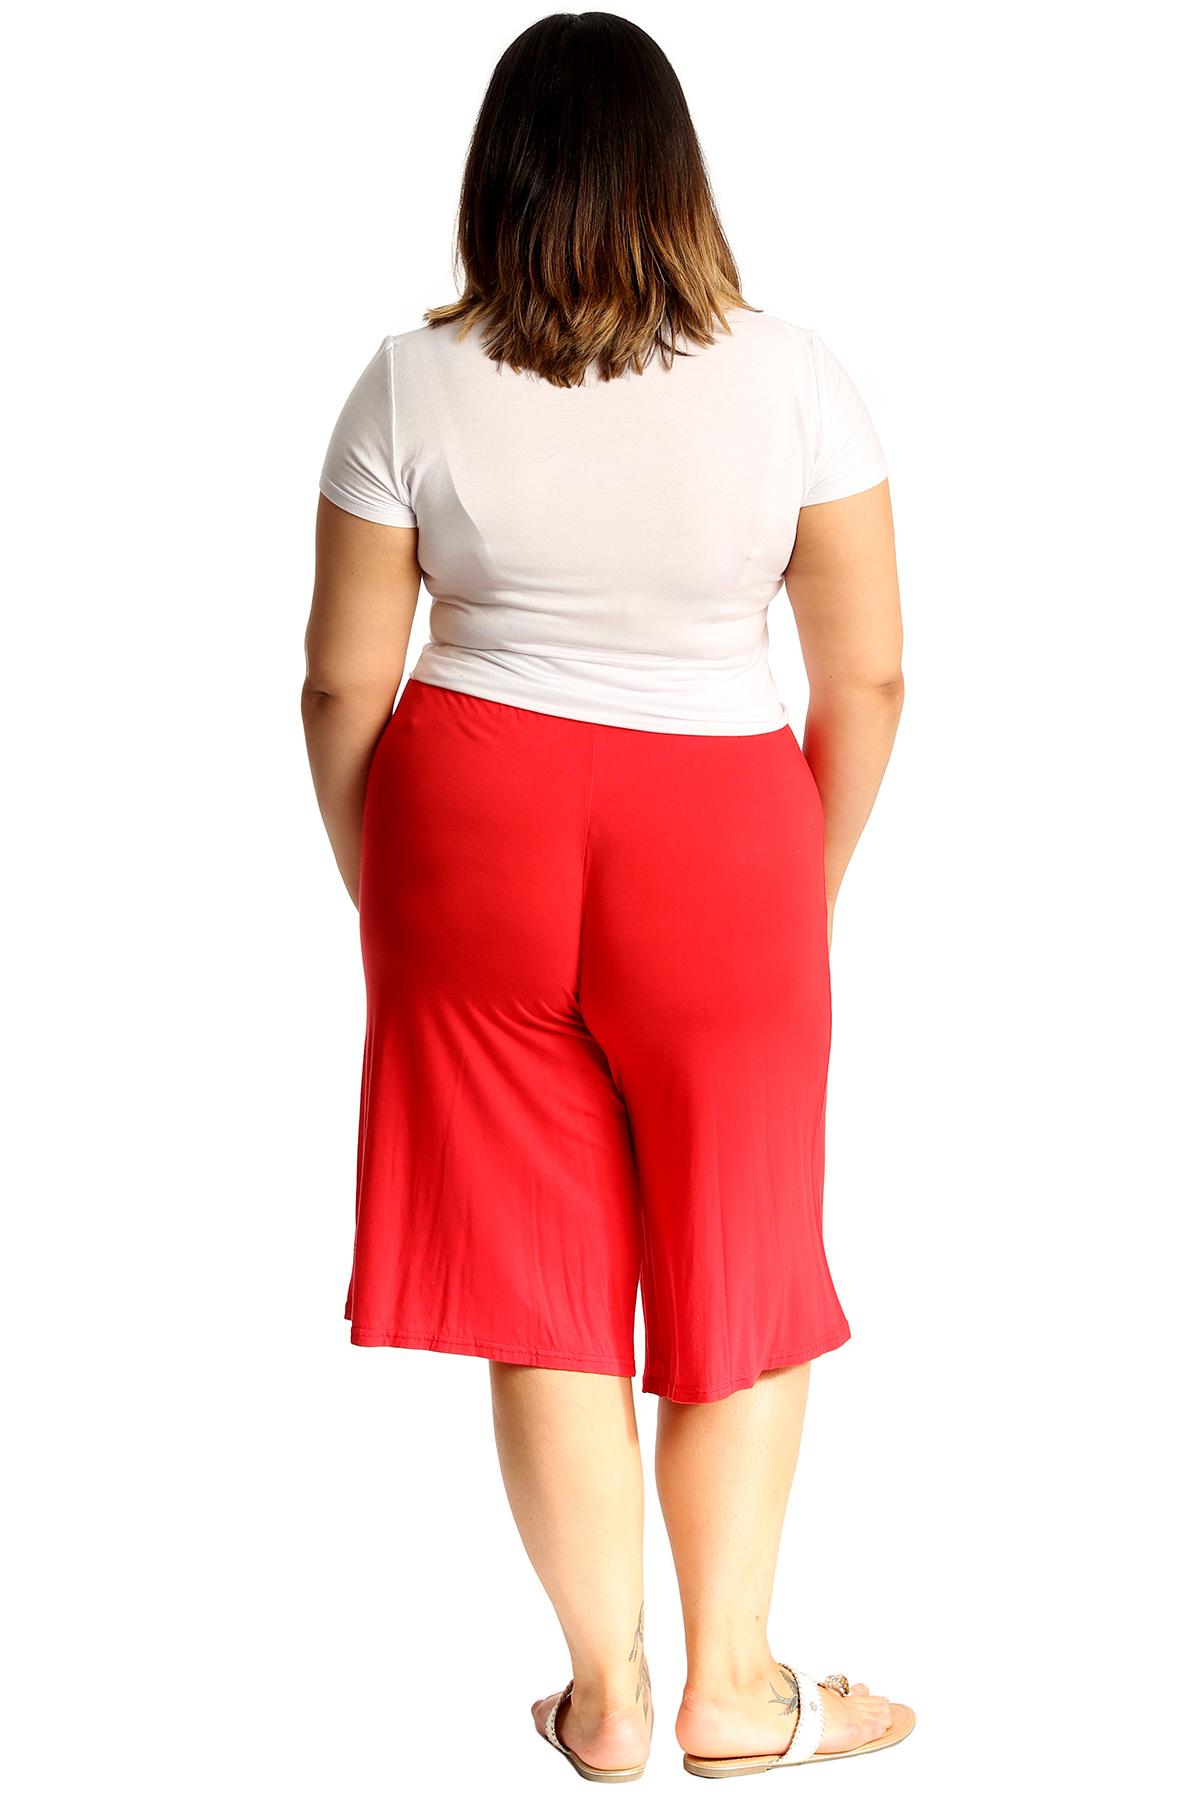 New-Womens-Plus-Size-Culottes-Ladies-Plain-Shorts-Palazzo-Elastic-Pants-Summer thumbnail 36